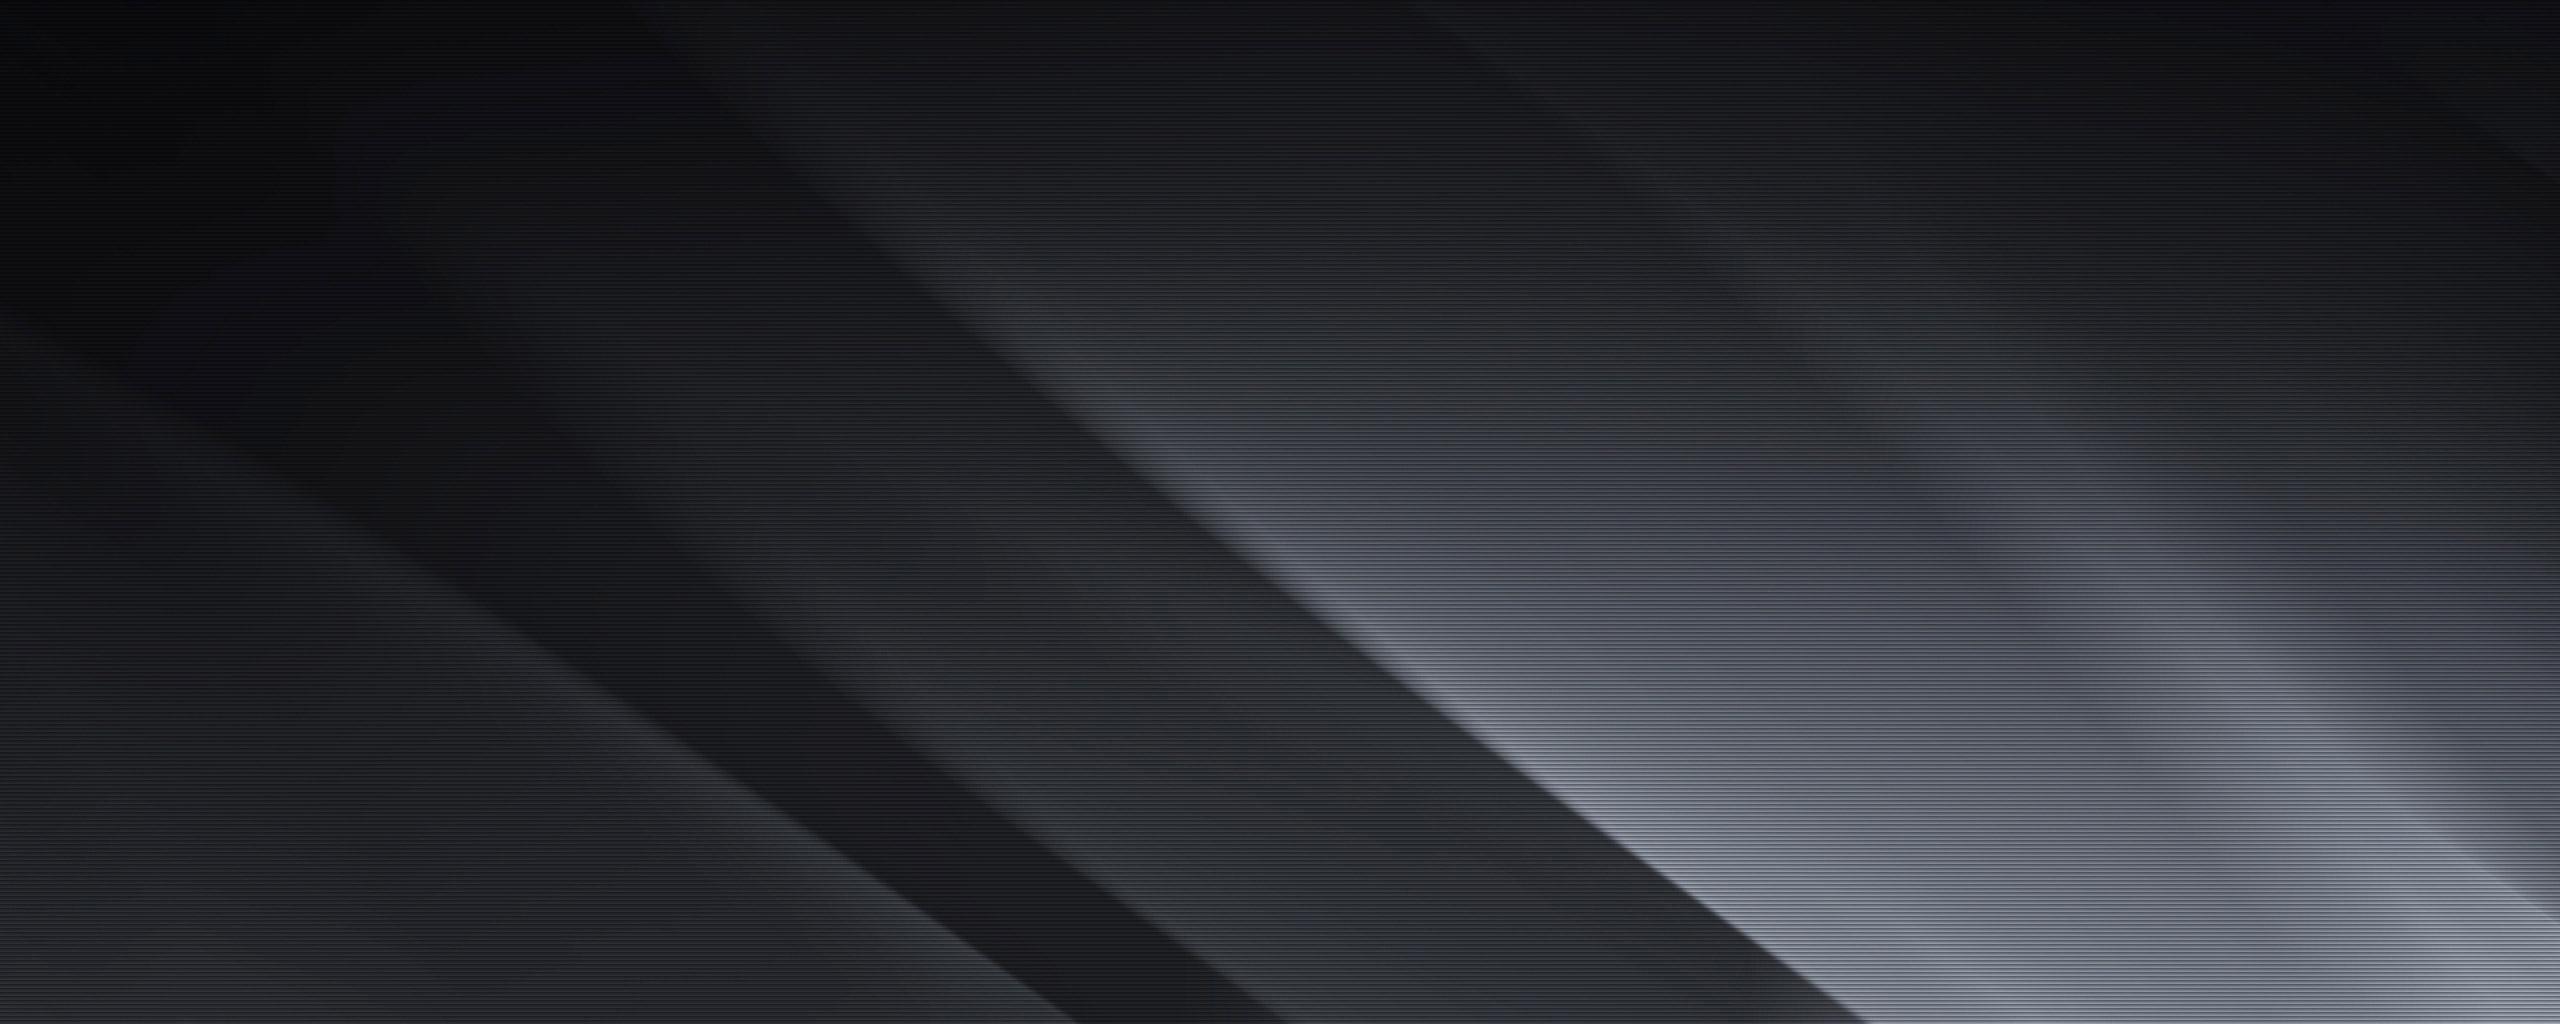 Download dual monitor wallpaper dual monitor [2560x1024